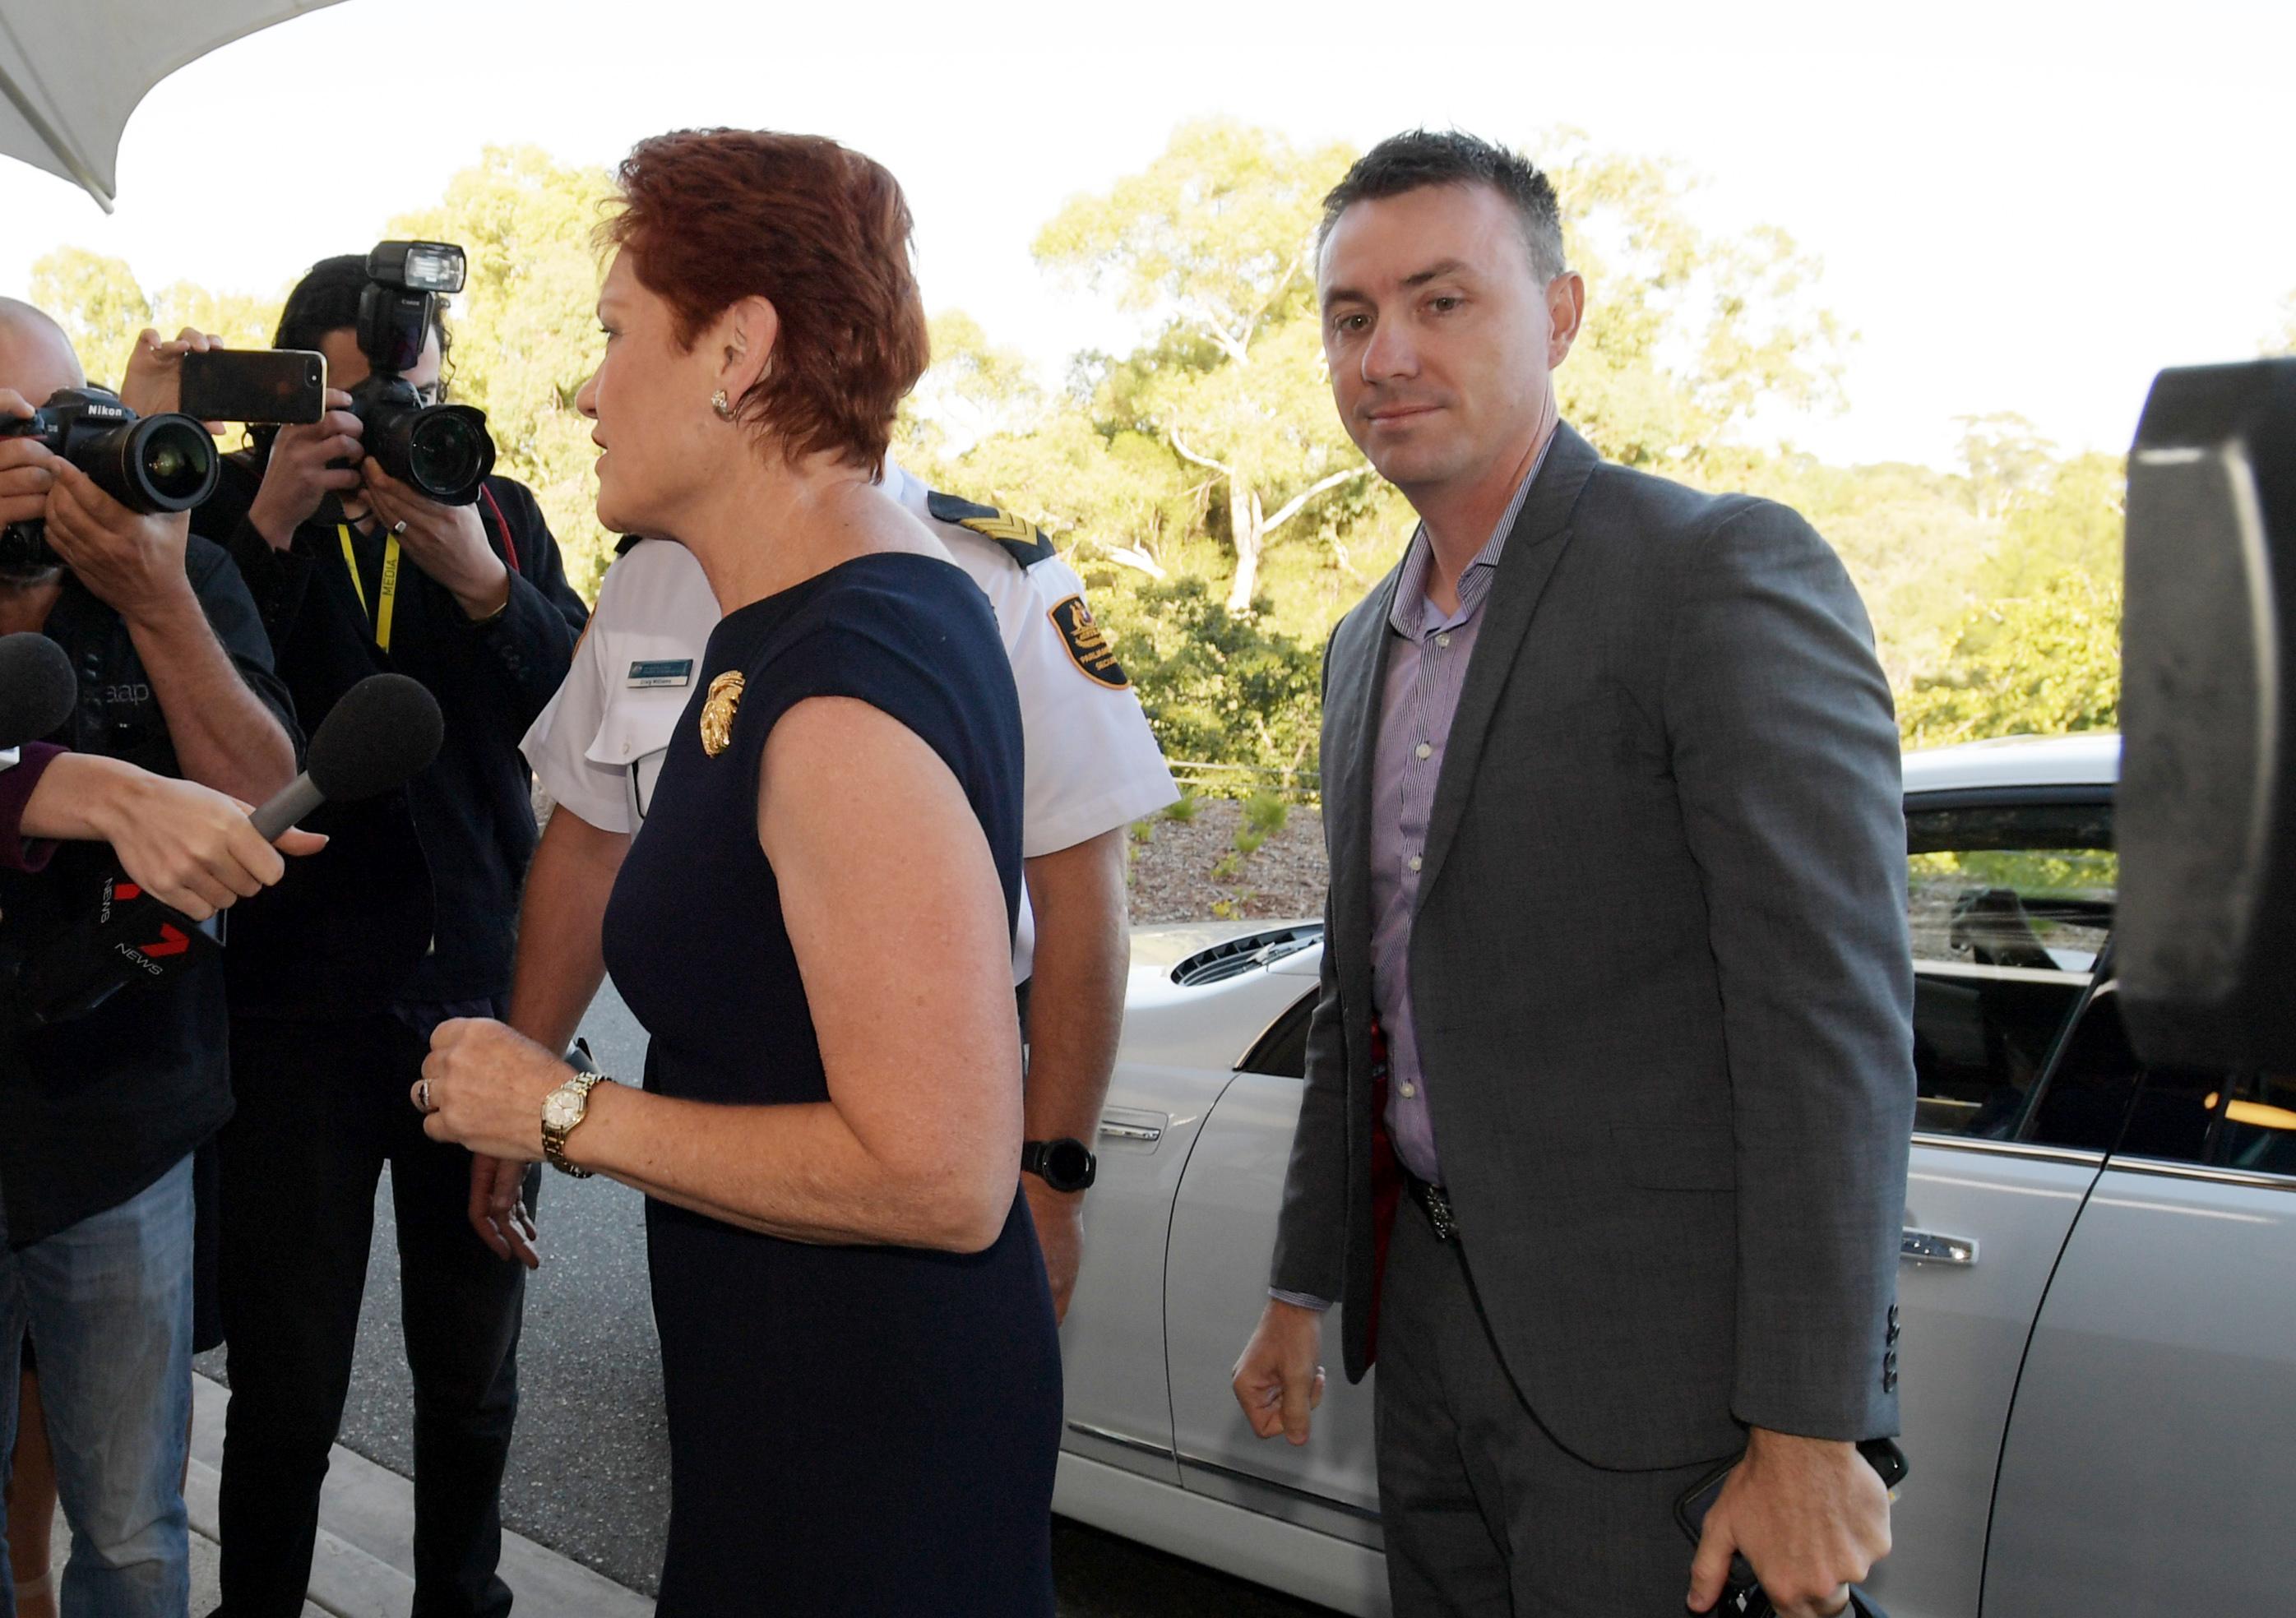 Senator Pauline Hanson and James Ashby (R) arrive at doors at Parliament House